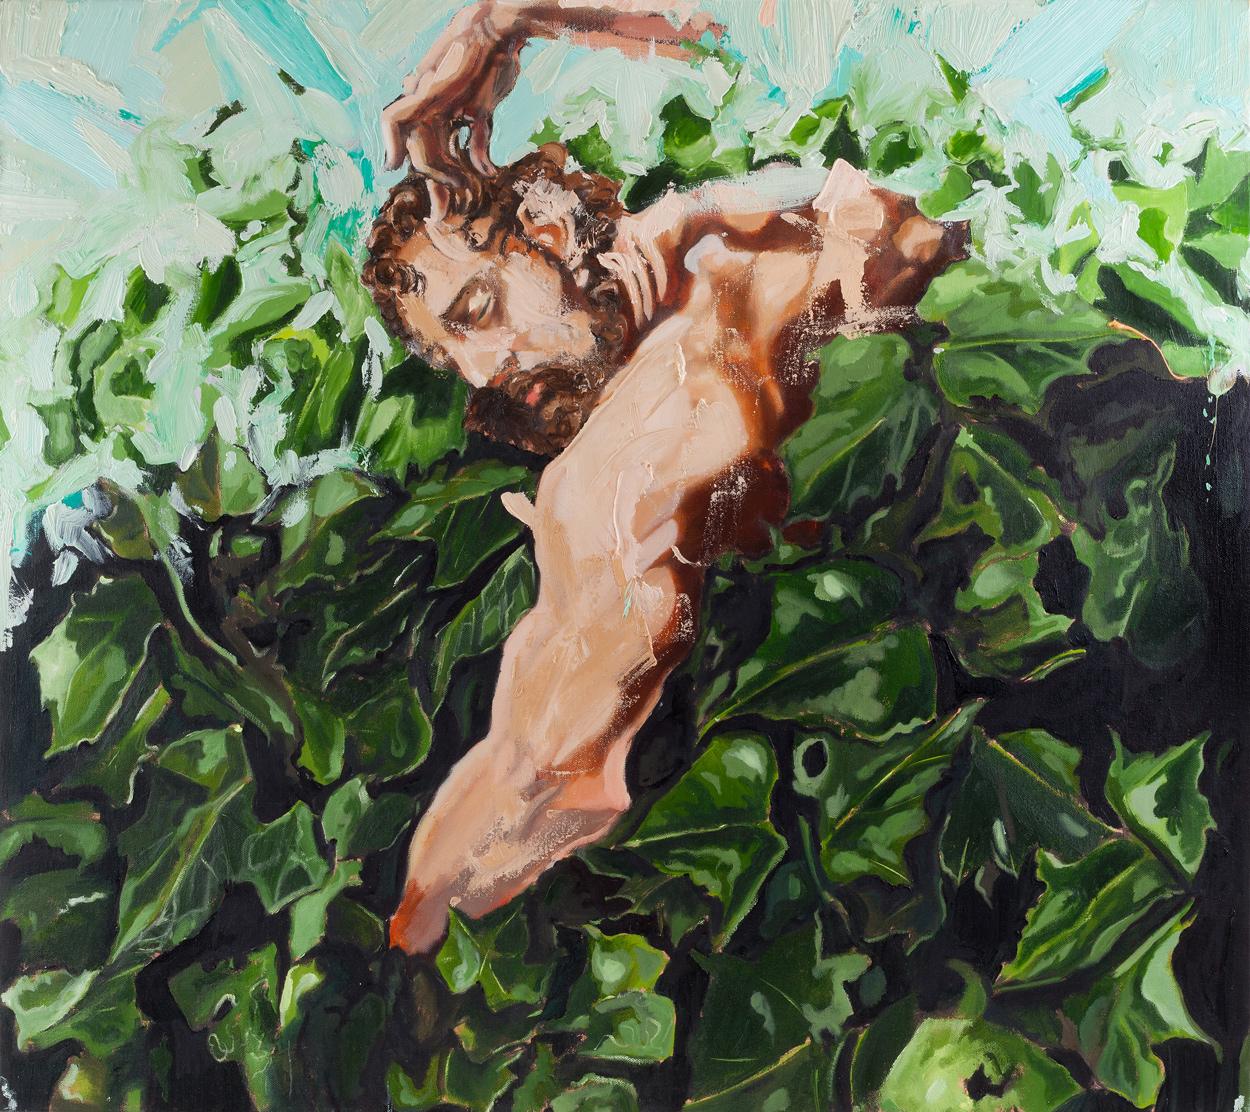 Ivy Samson II, Oil on canvas, 80x90 cm, 2013